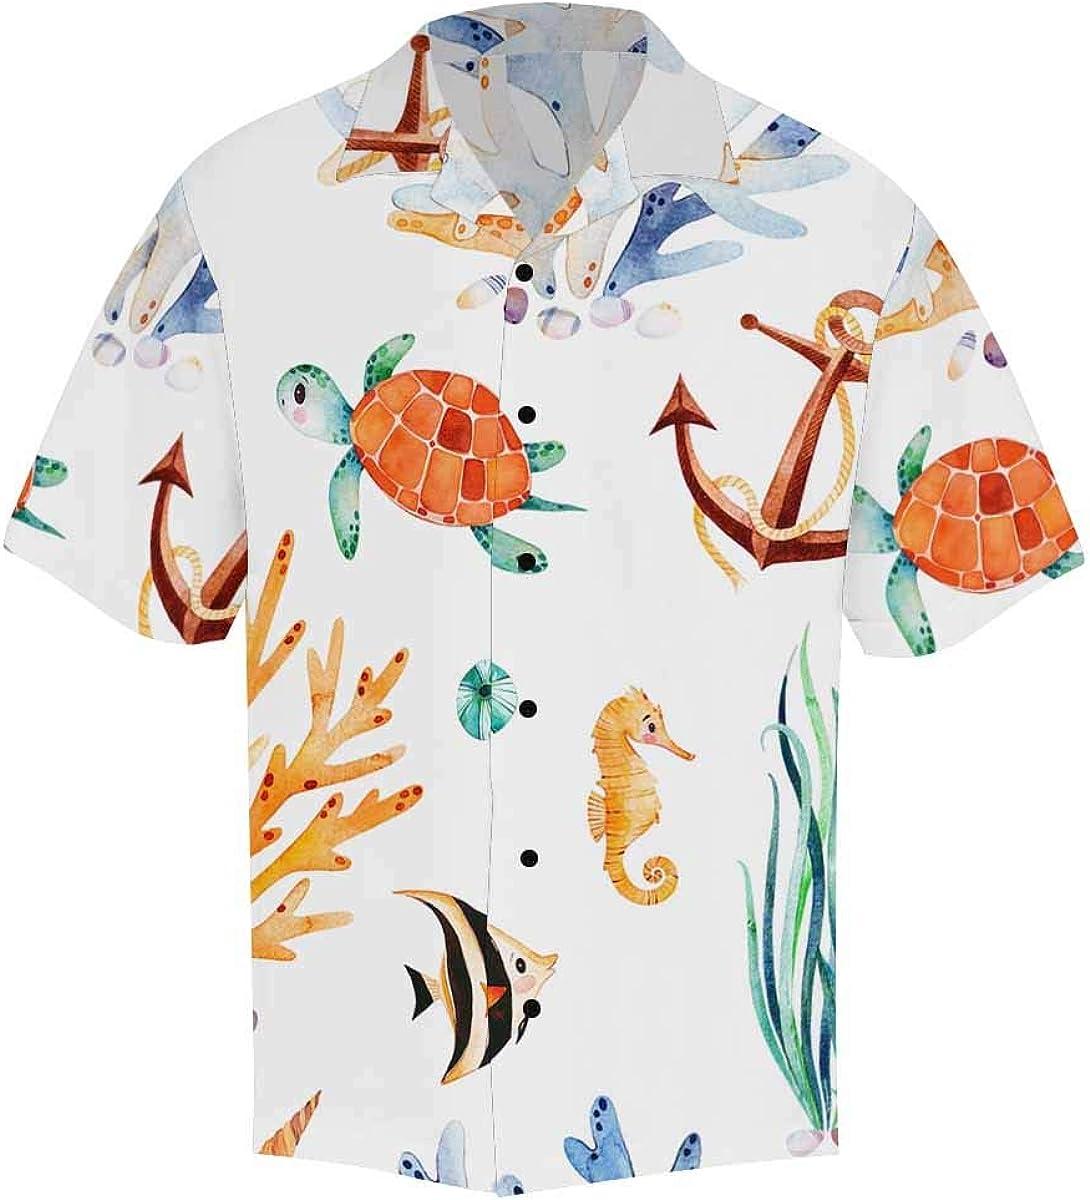 InterestPrint Men's Casual Button Down Short Sleeve Nautical Anchor Ship Hawaiian Shirt (S-5XL)